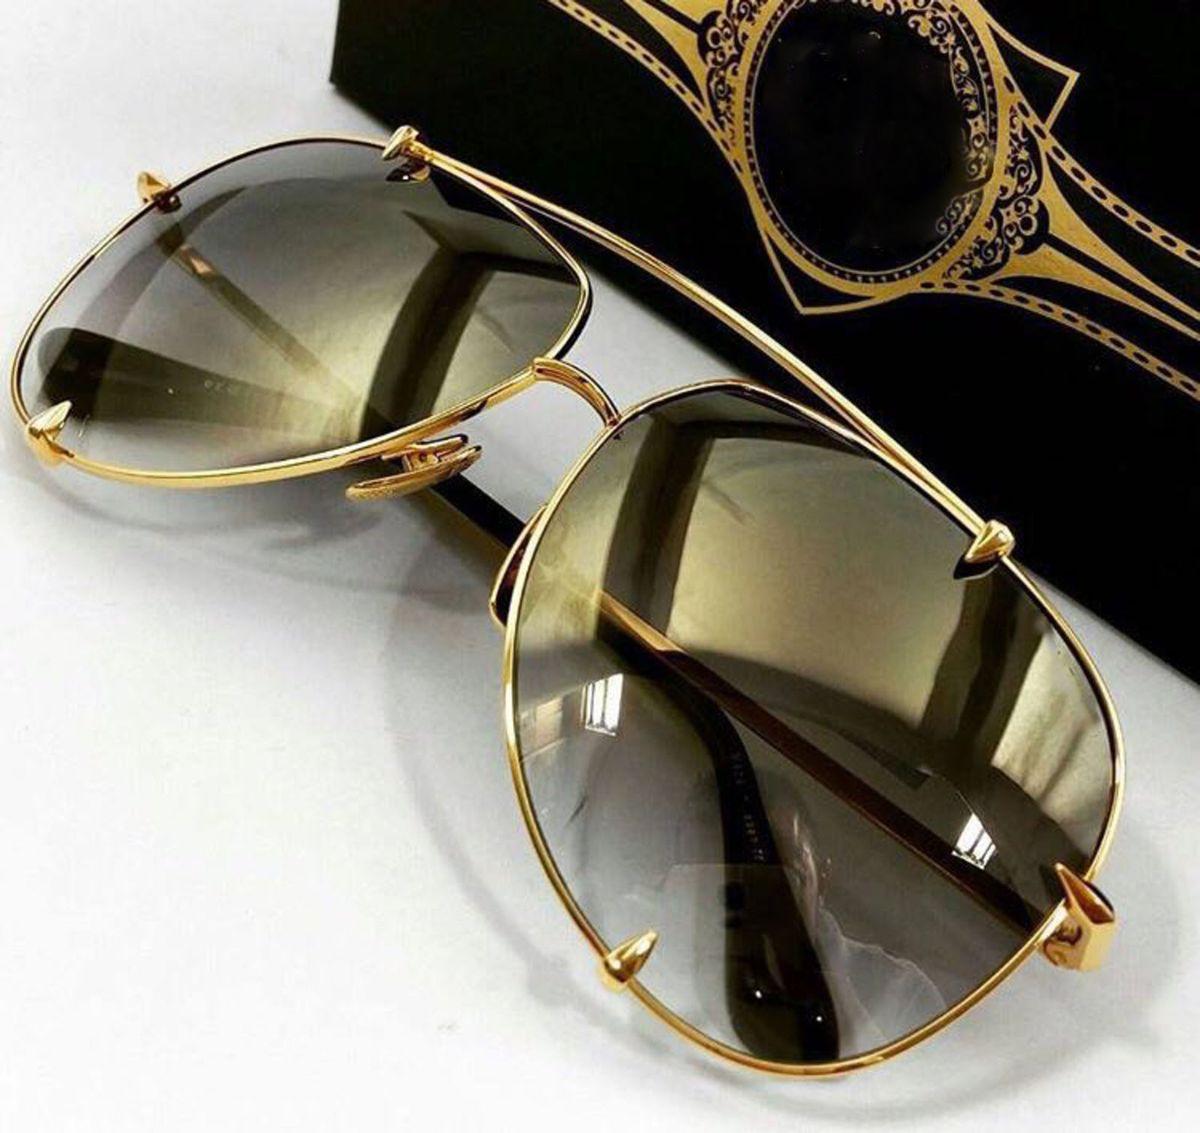 31cf31aaf14d0 óculos dita talon - óculos dita.  Czm6ly9wag90b3muzw5qb2vplmnvbs5ici9wcm9kdwn0cy80njcyotq2l2uxmwzhnmuxnmmymmfjnte4ytvkzwrlm2nlzmziotg4lmpwzw  ...